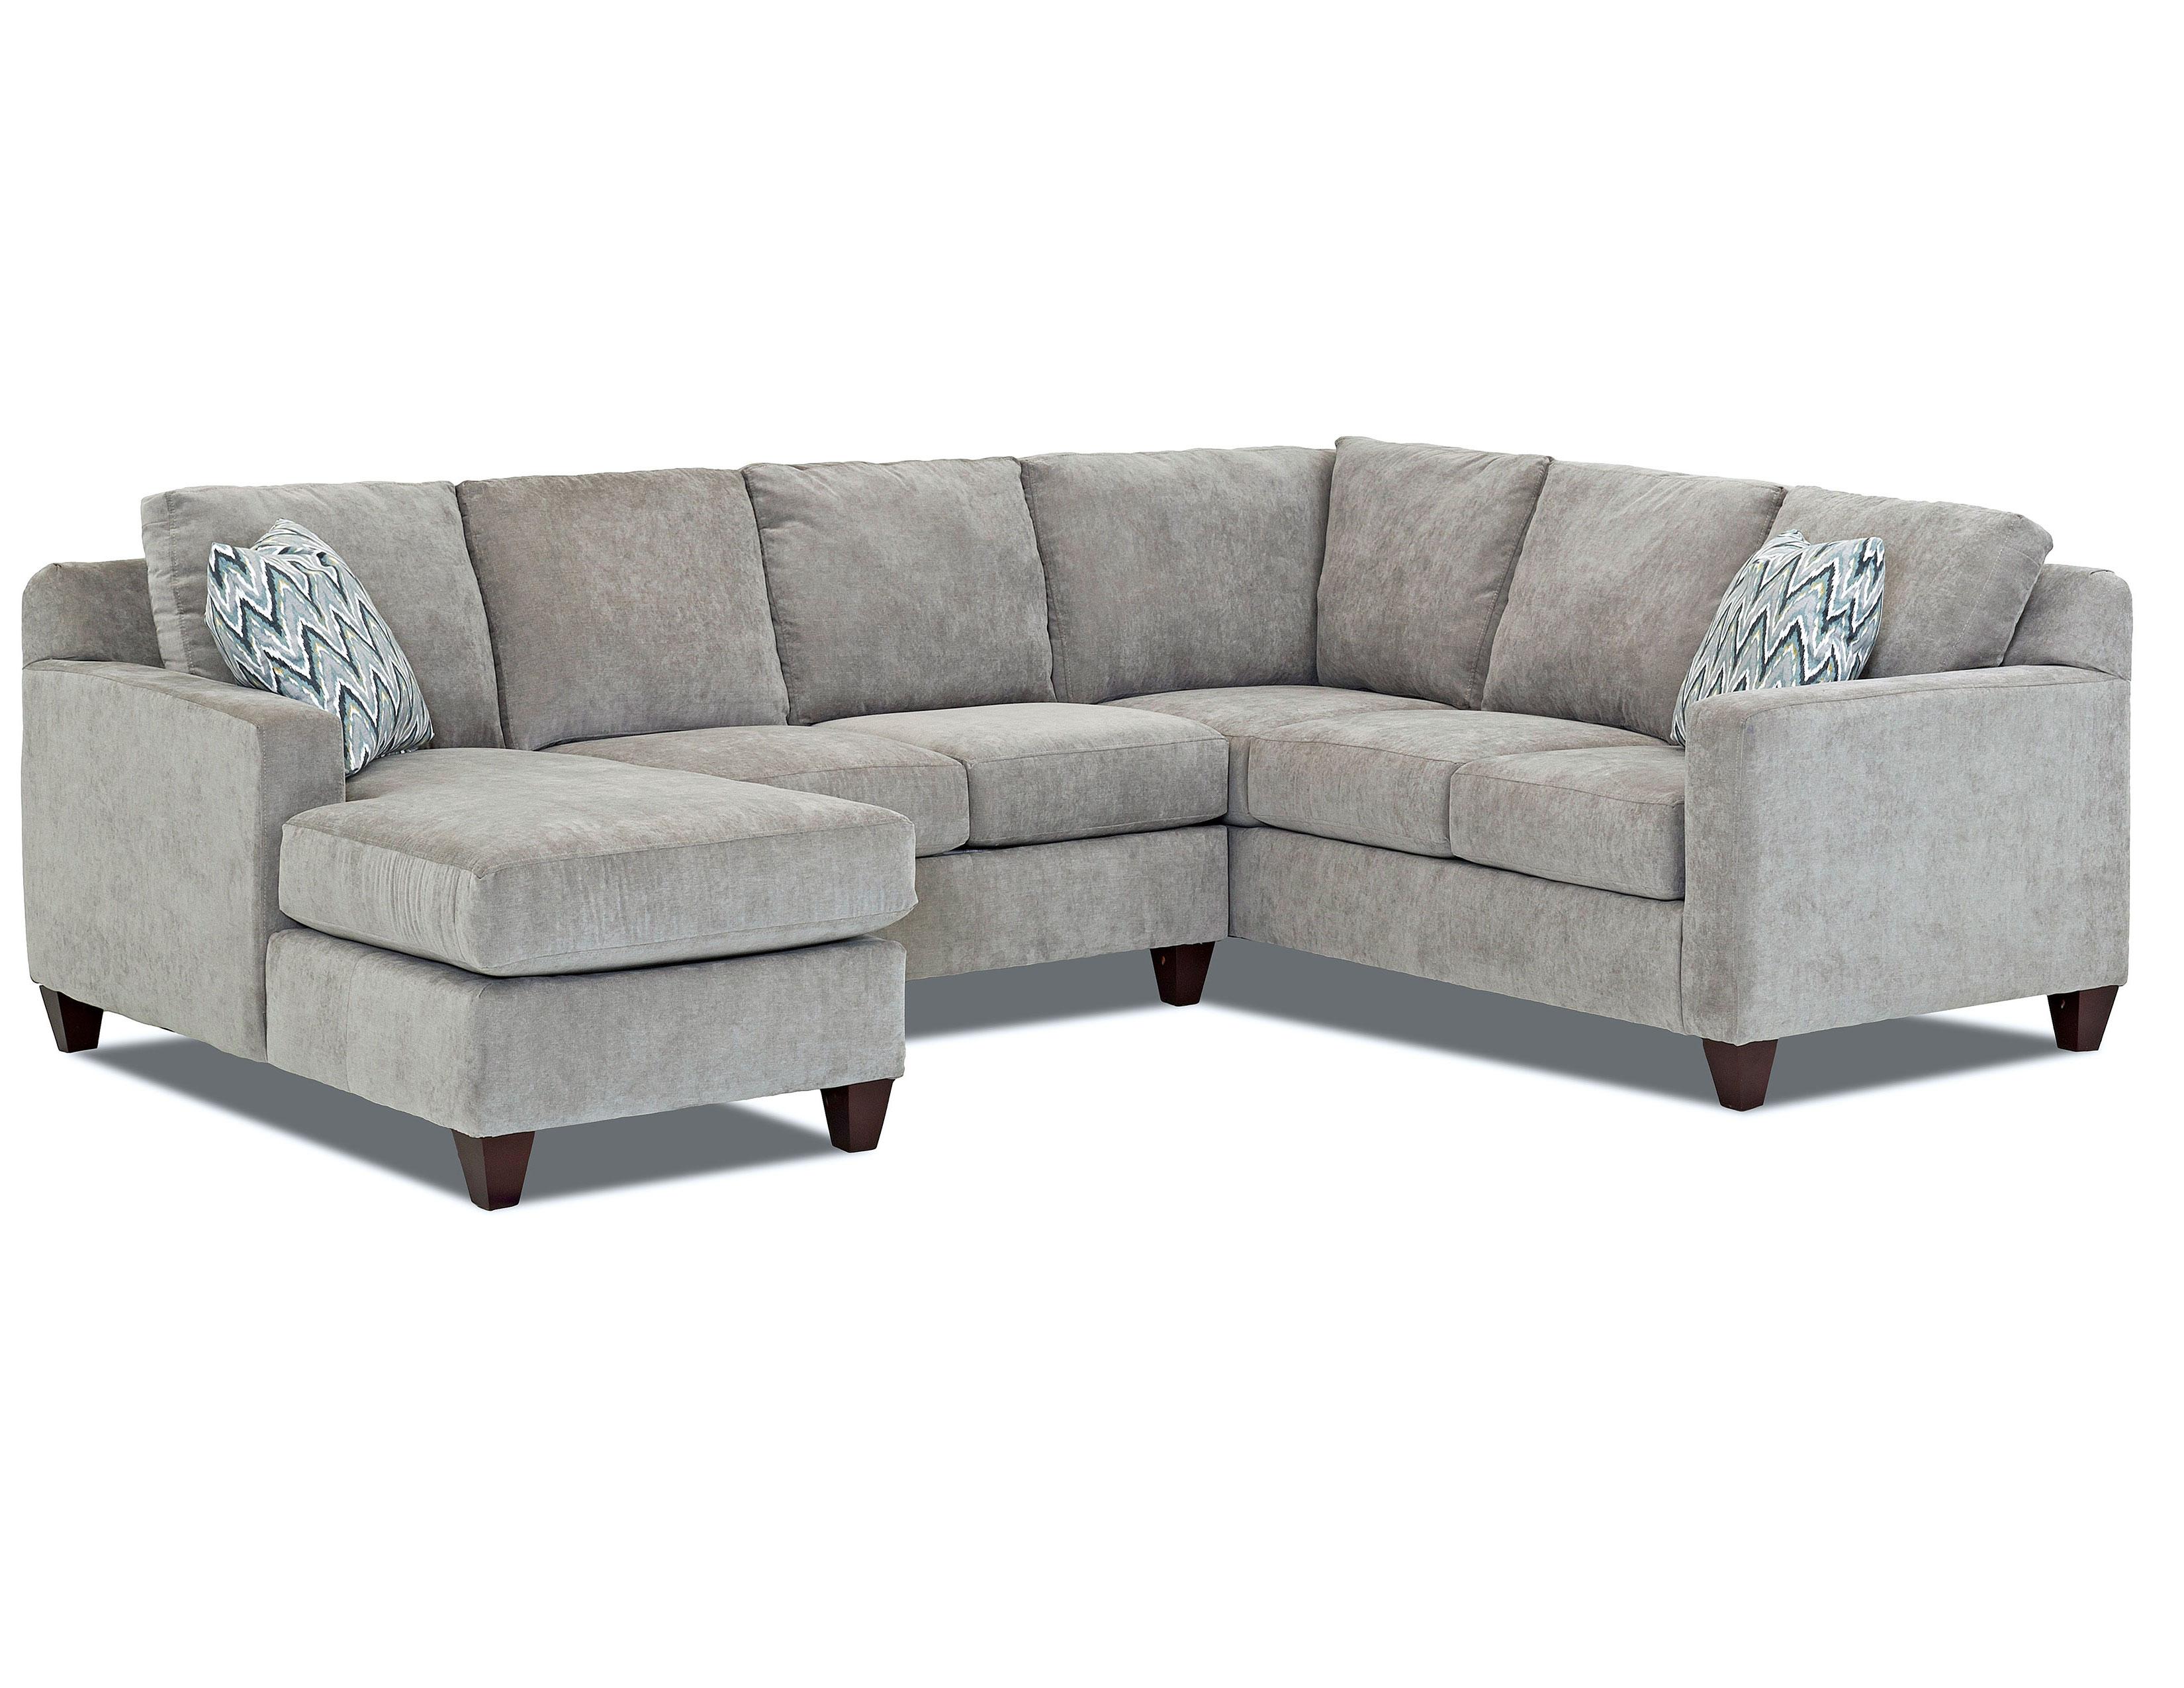 Miraculous Bosco K51600 Sectional Hundreds Of Fabrics Sofas And Beatyapartments Chair Design Images Beatyapartmentscom